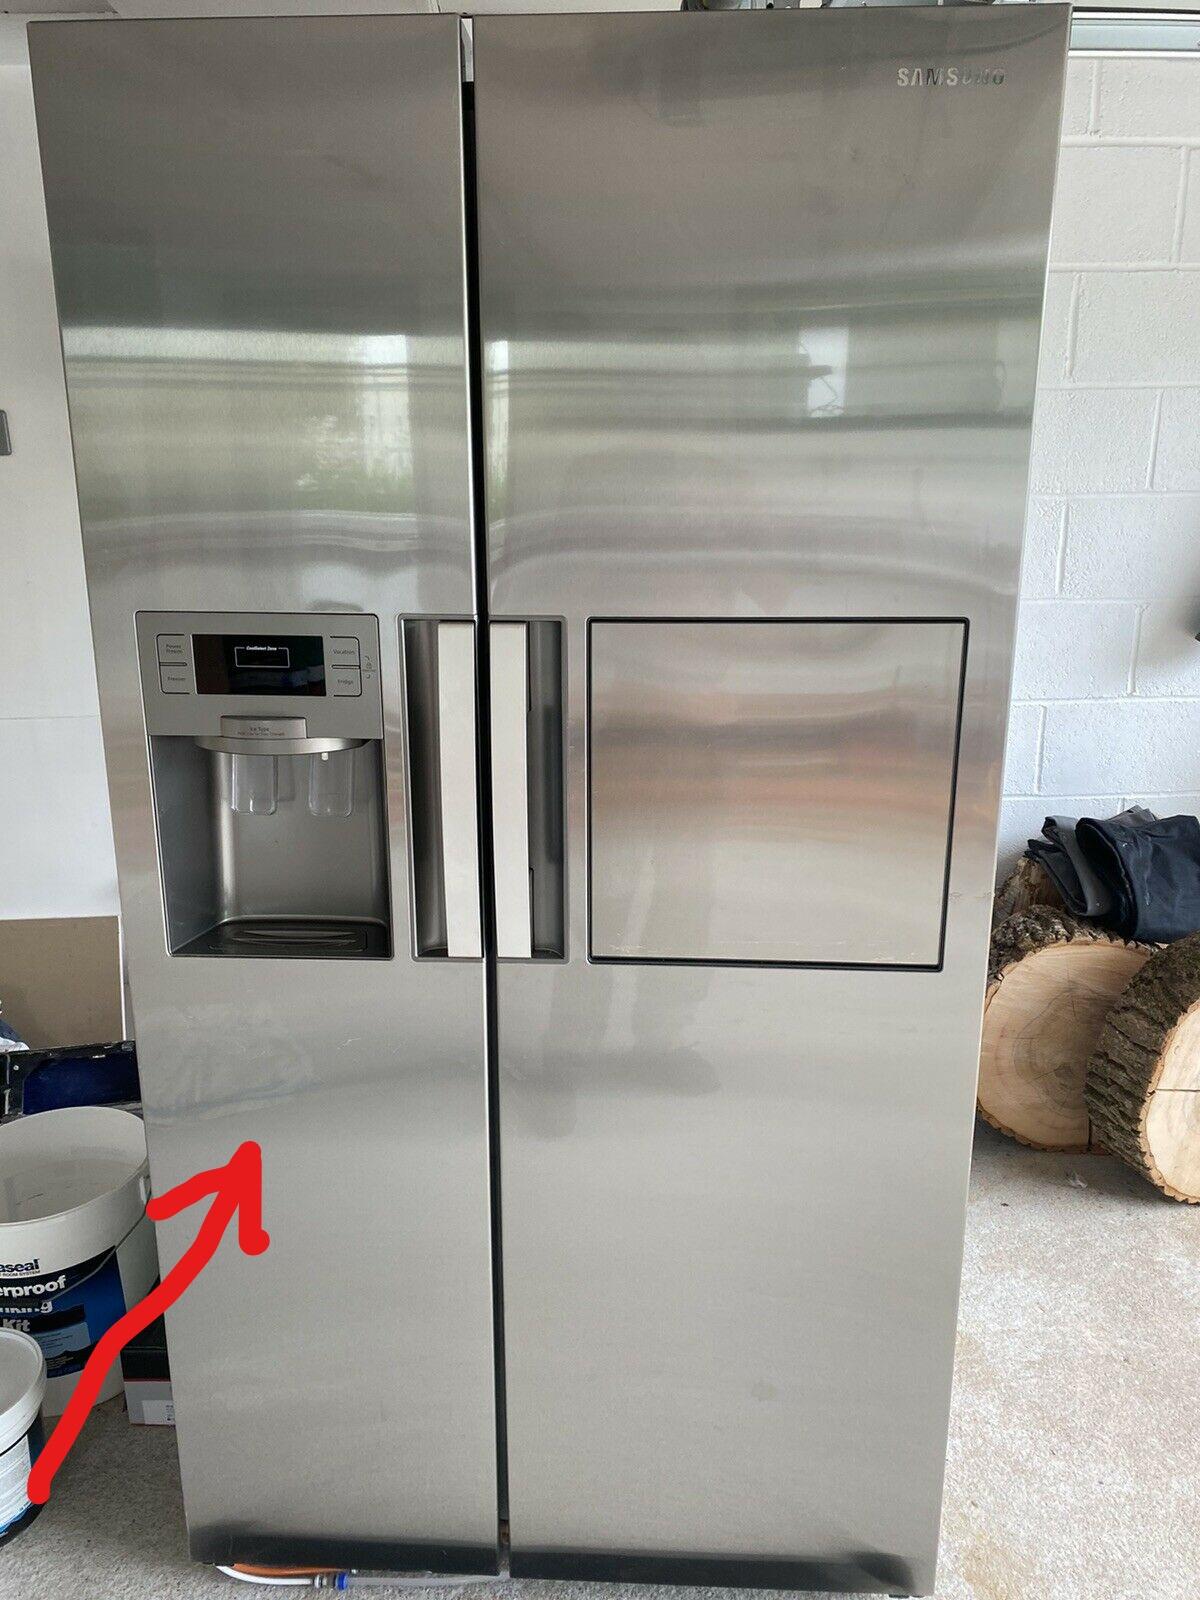 Freezer Door - for Samsung Fridge ((Model : RSH7PNRS)